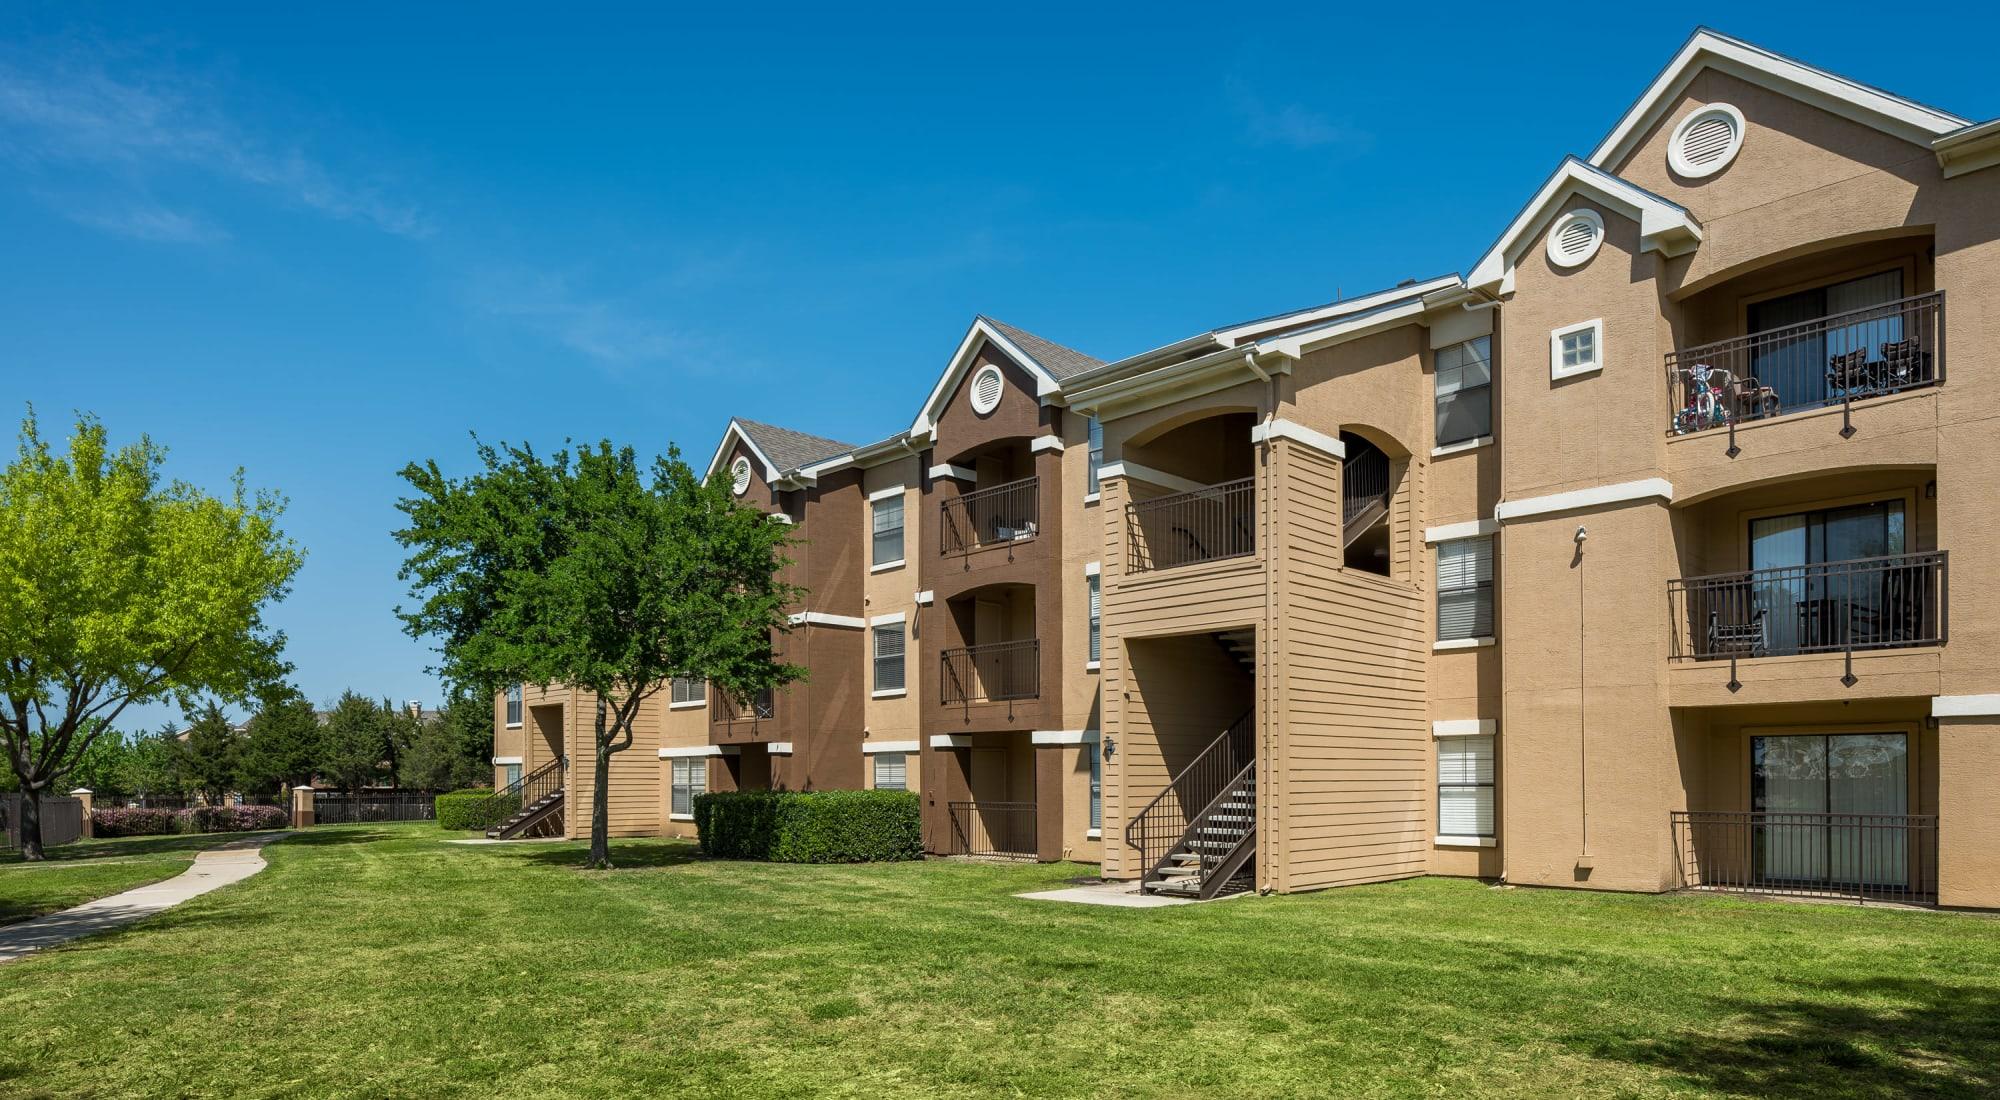 Pet-friendly apartments at Arbrook Park Apartment Homes in Arlington, Texas